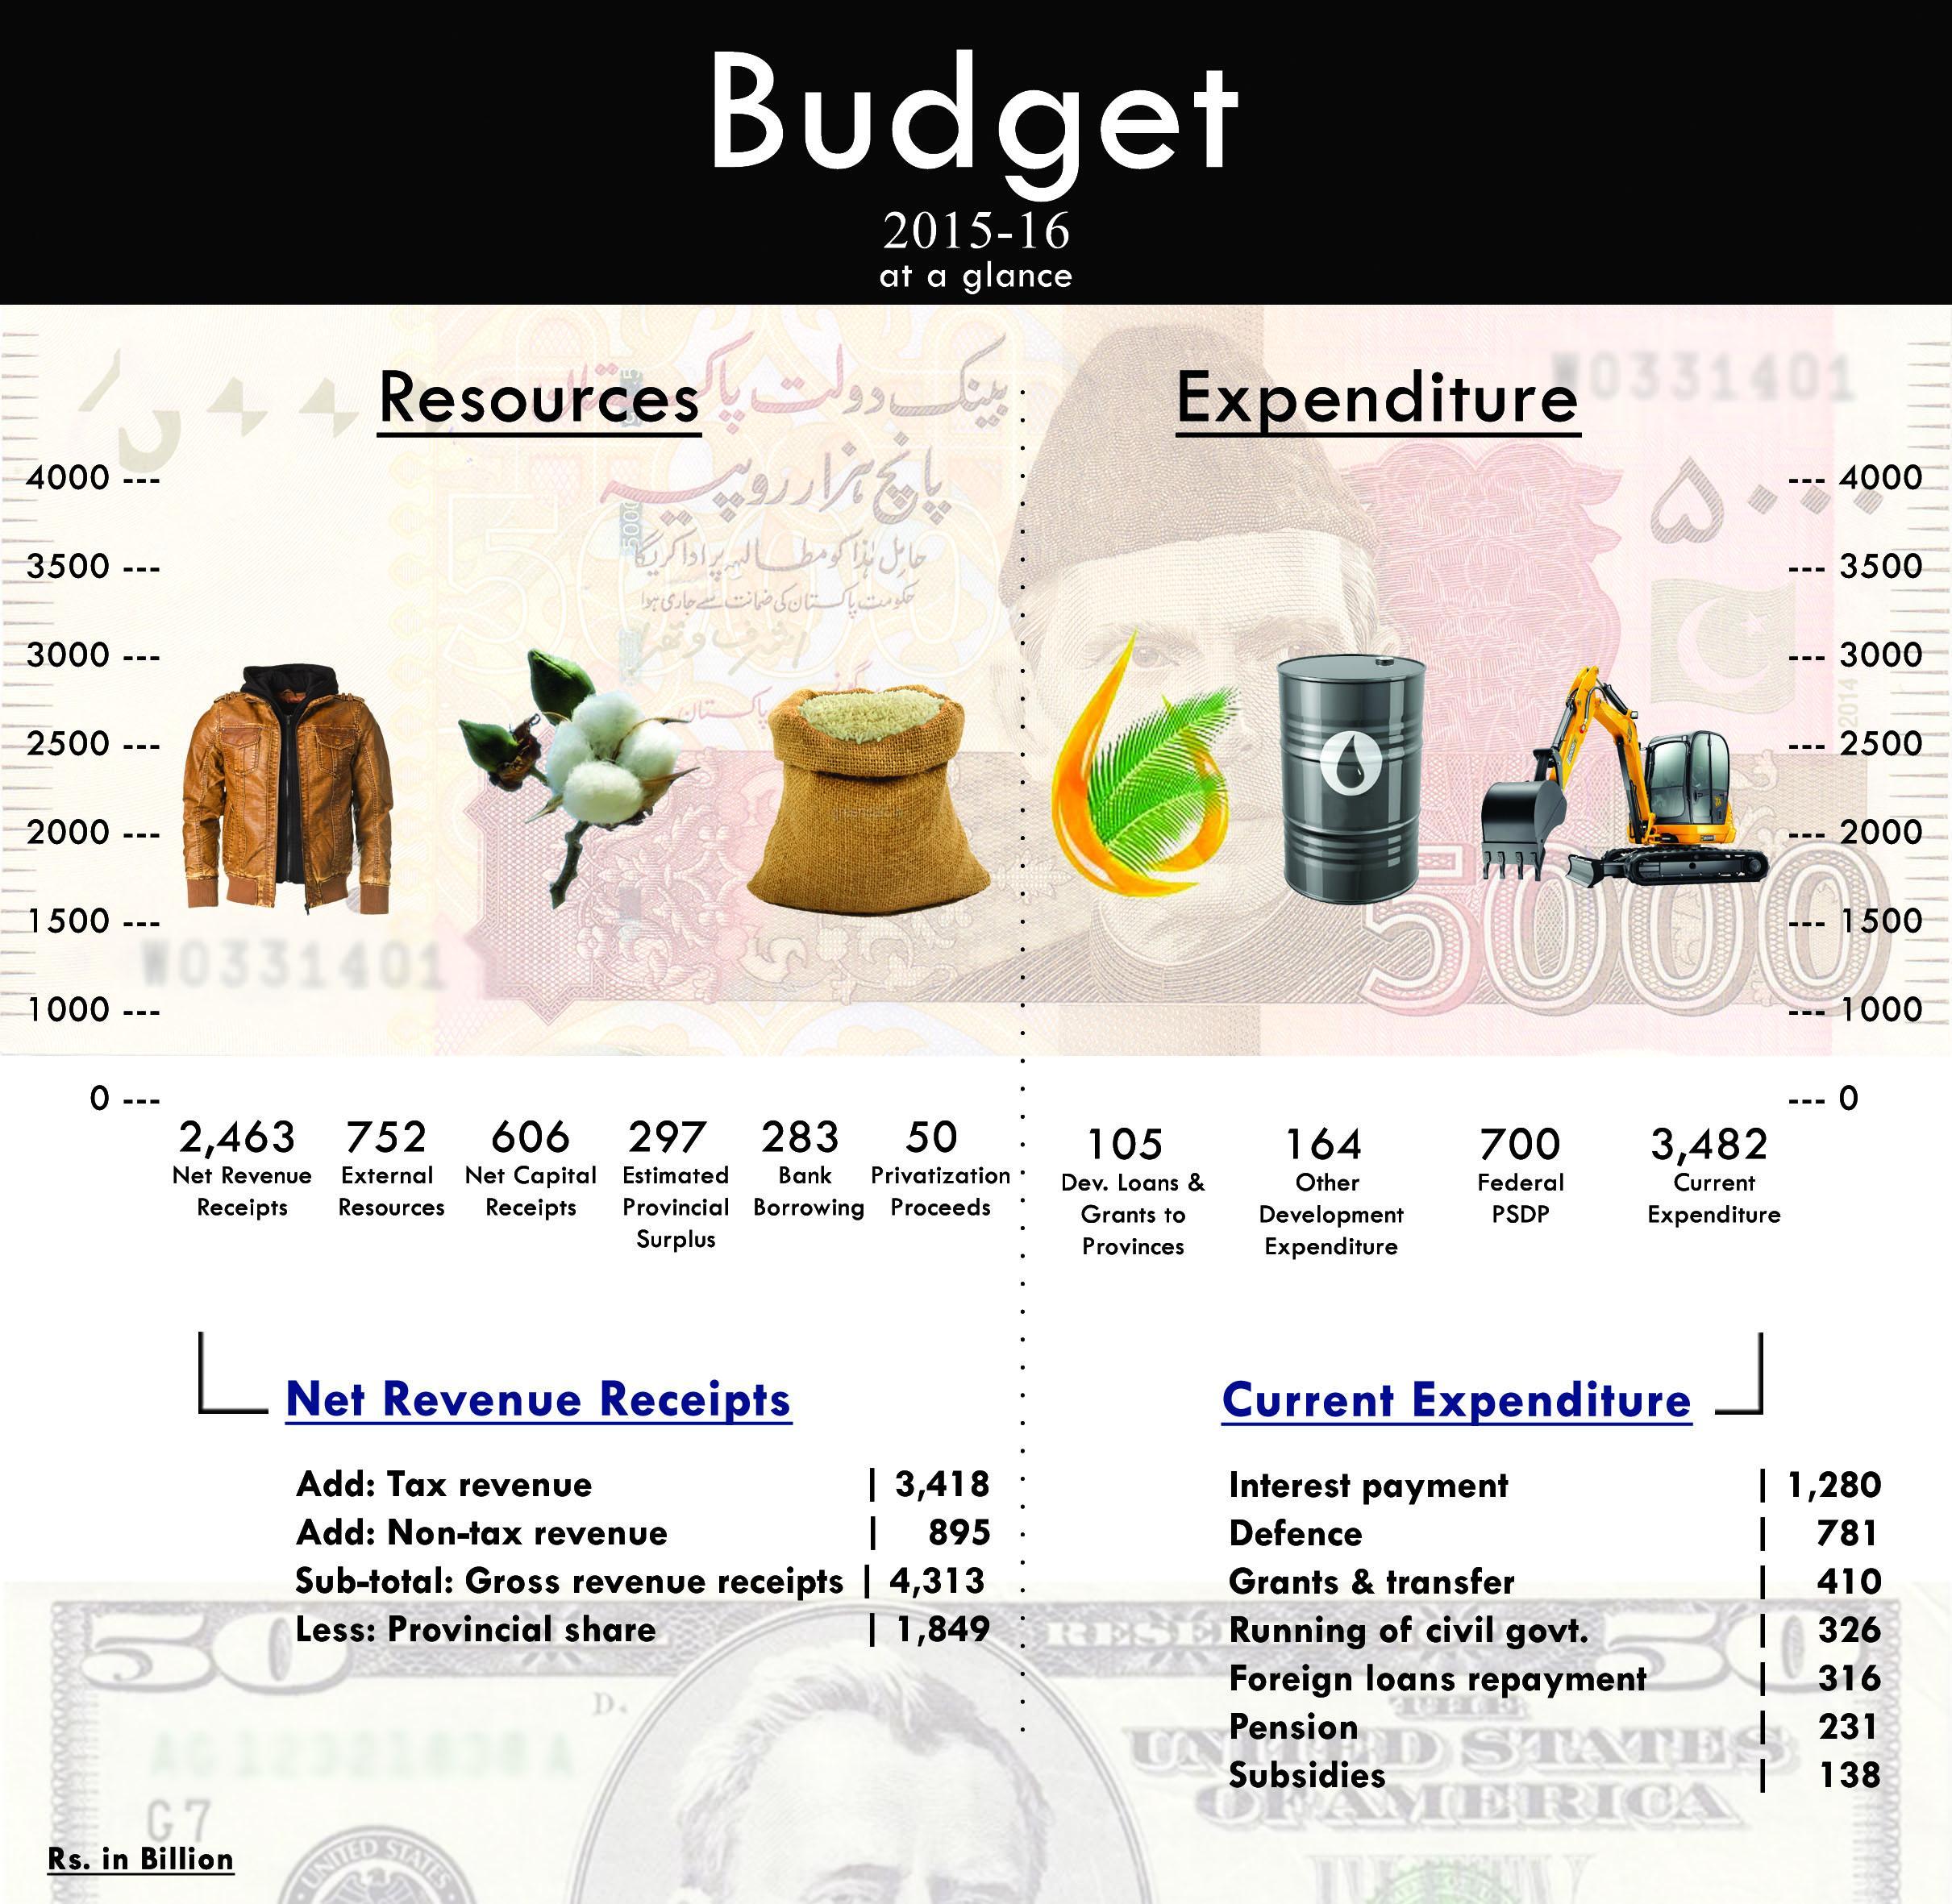 Budget at glance